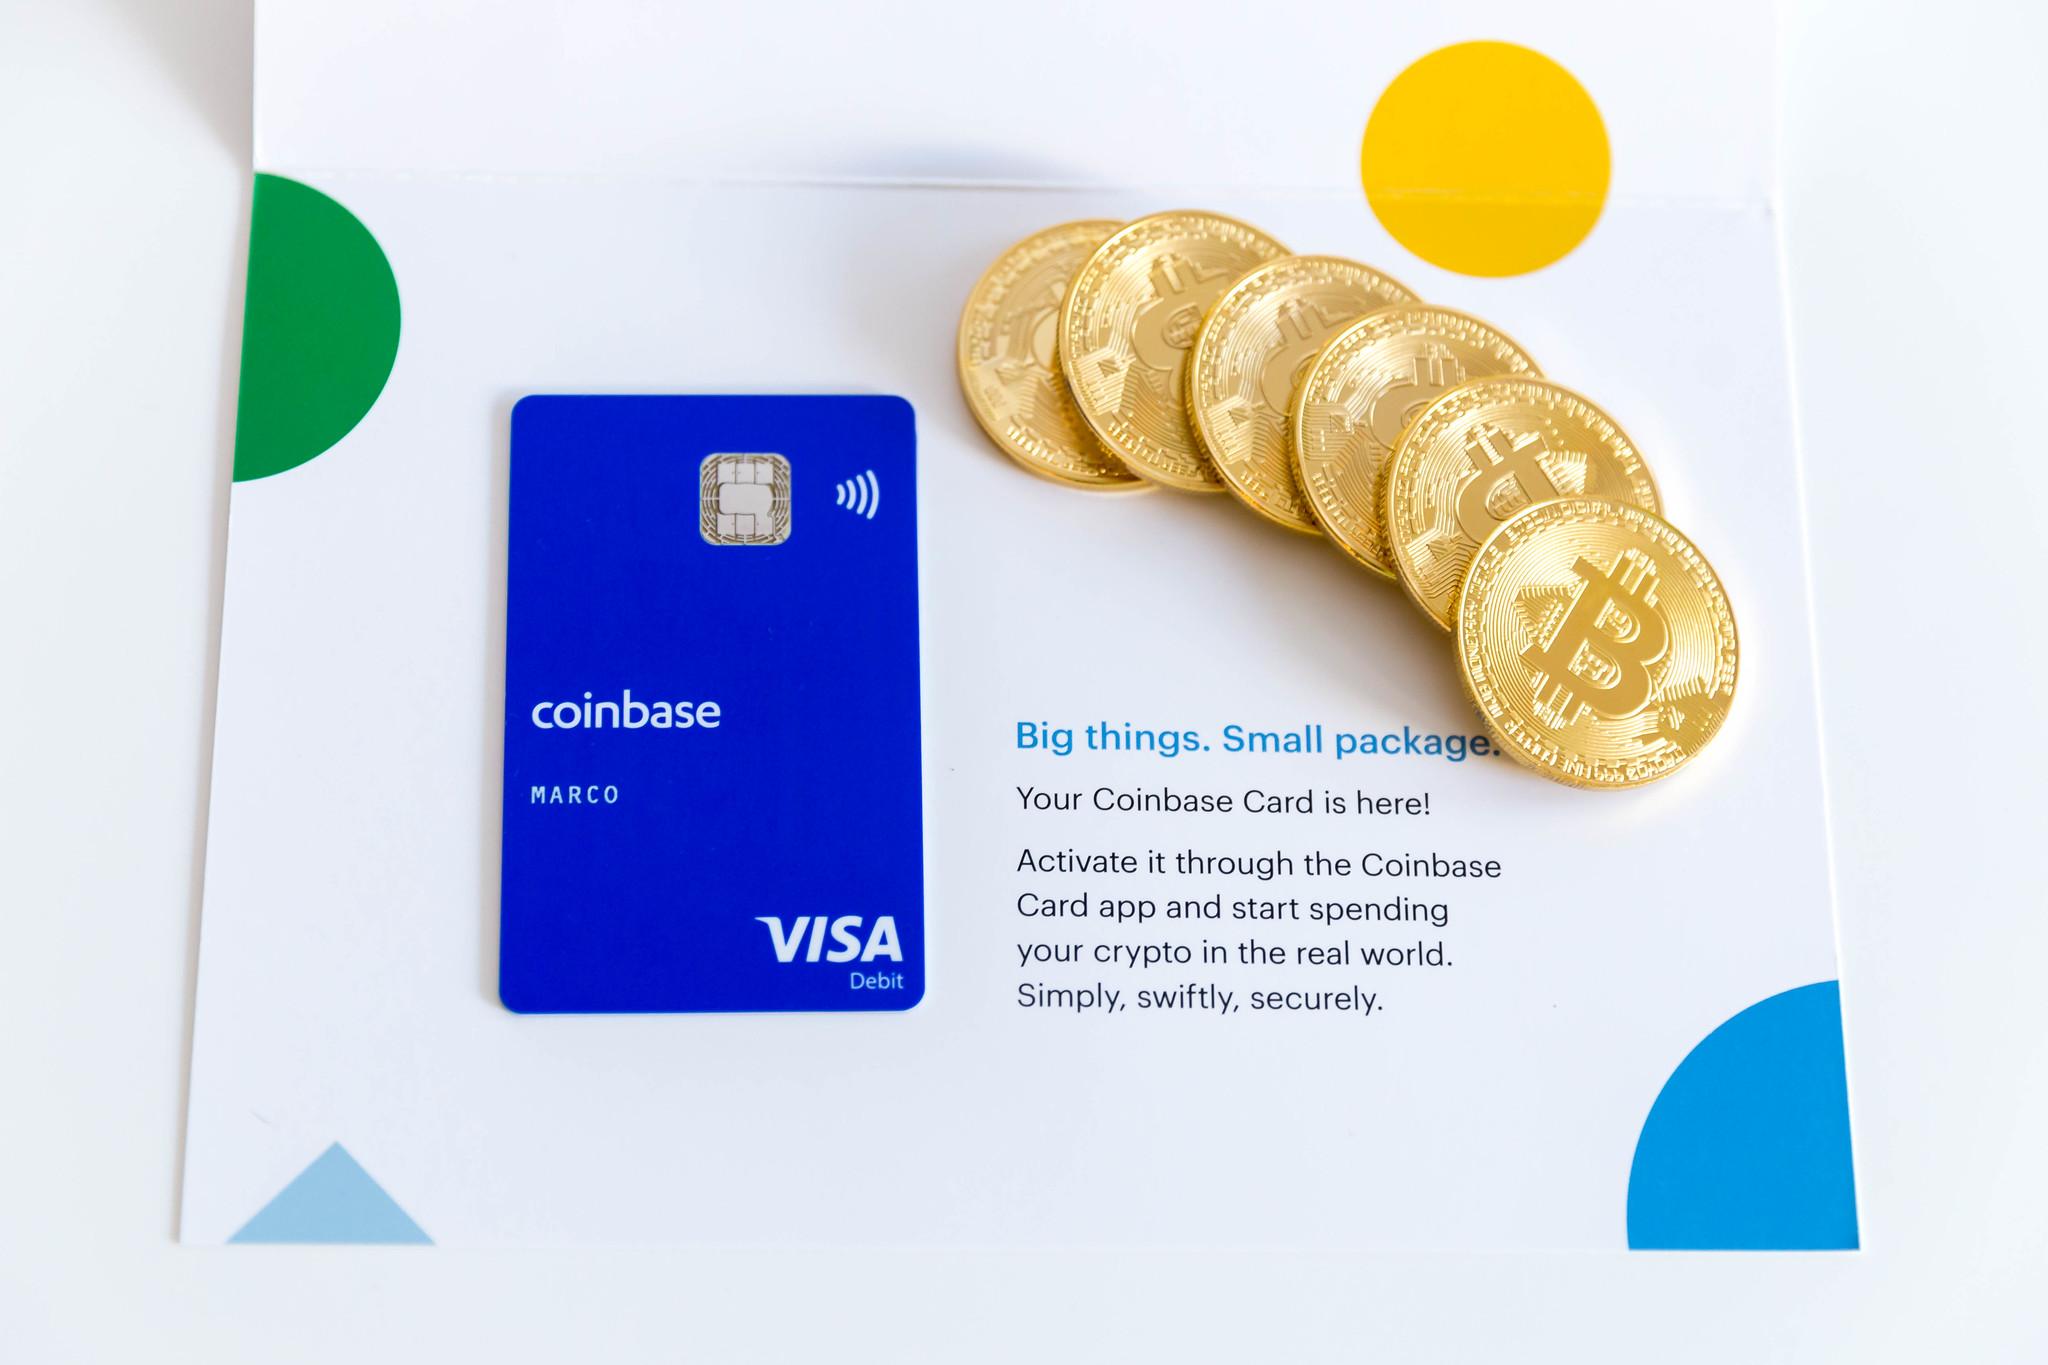 Кредитная карта Bitcoin Coinbase